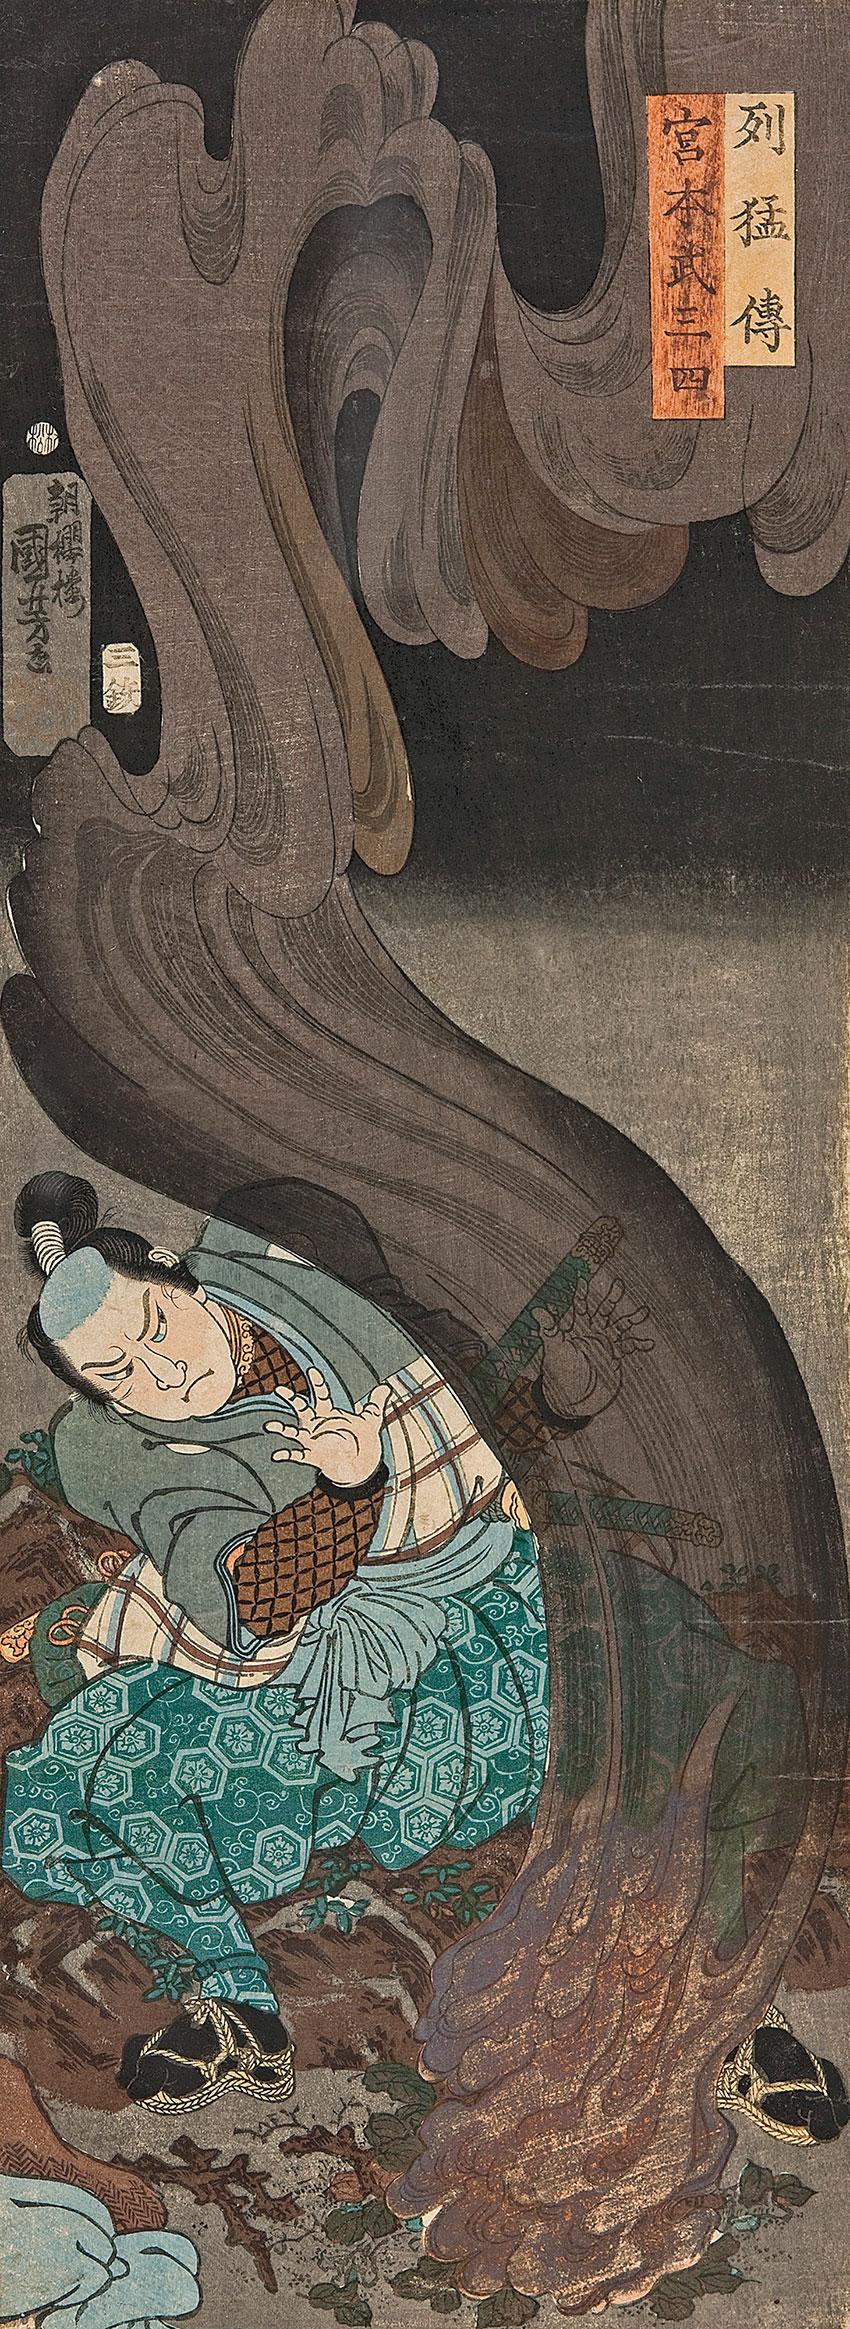 Utagawa Kuniyoshi, Japan, 1798 - 1861, Miyamoto Musashi, from the series Tales of fierce warriors (Retsumoden), c.1844-46 (1856), Edo (Tokyo), woodblock print, ink and colour on paper, 49.2 x 18.3 cm